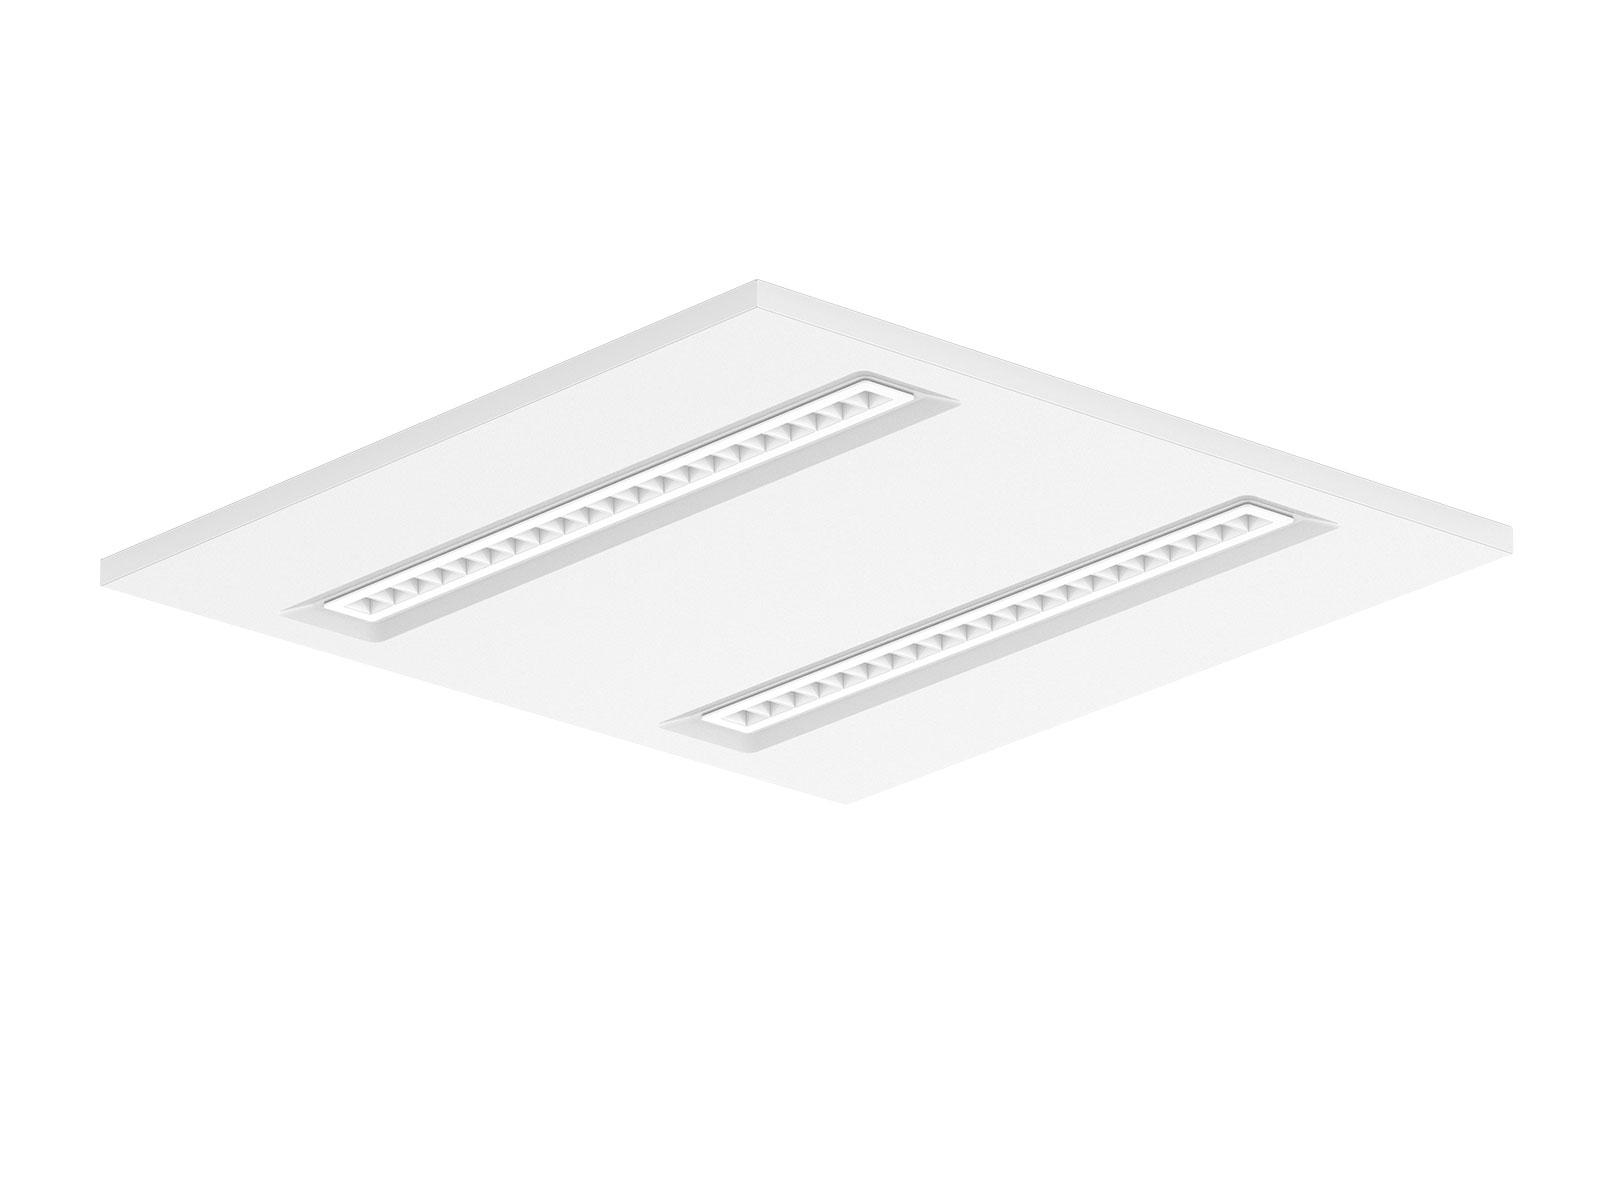 Pl Az High Output 2x2 1x4 Ceiling Light Panels